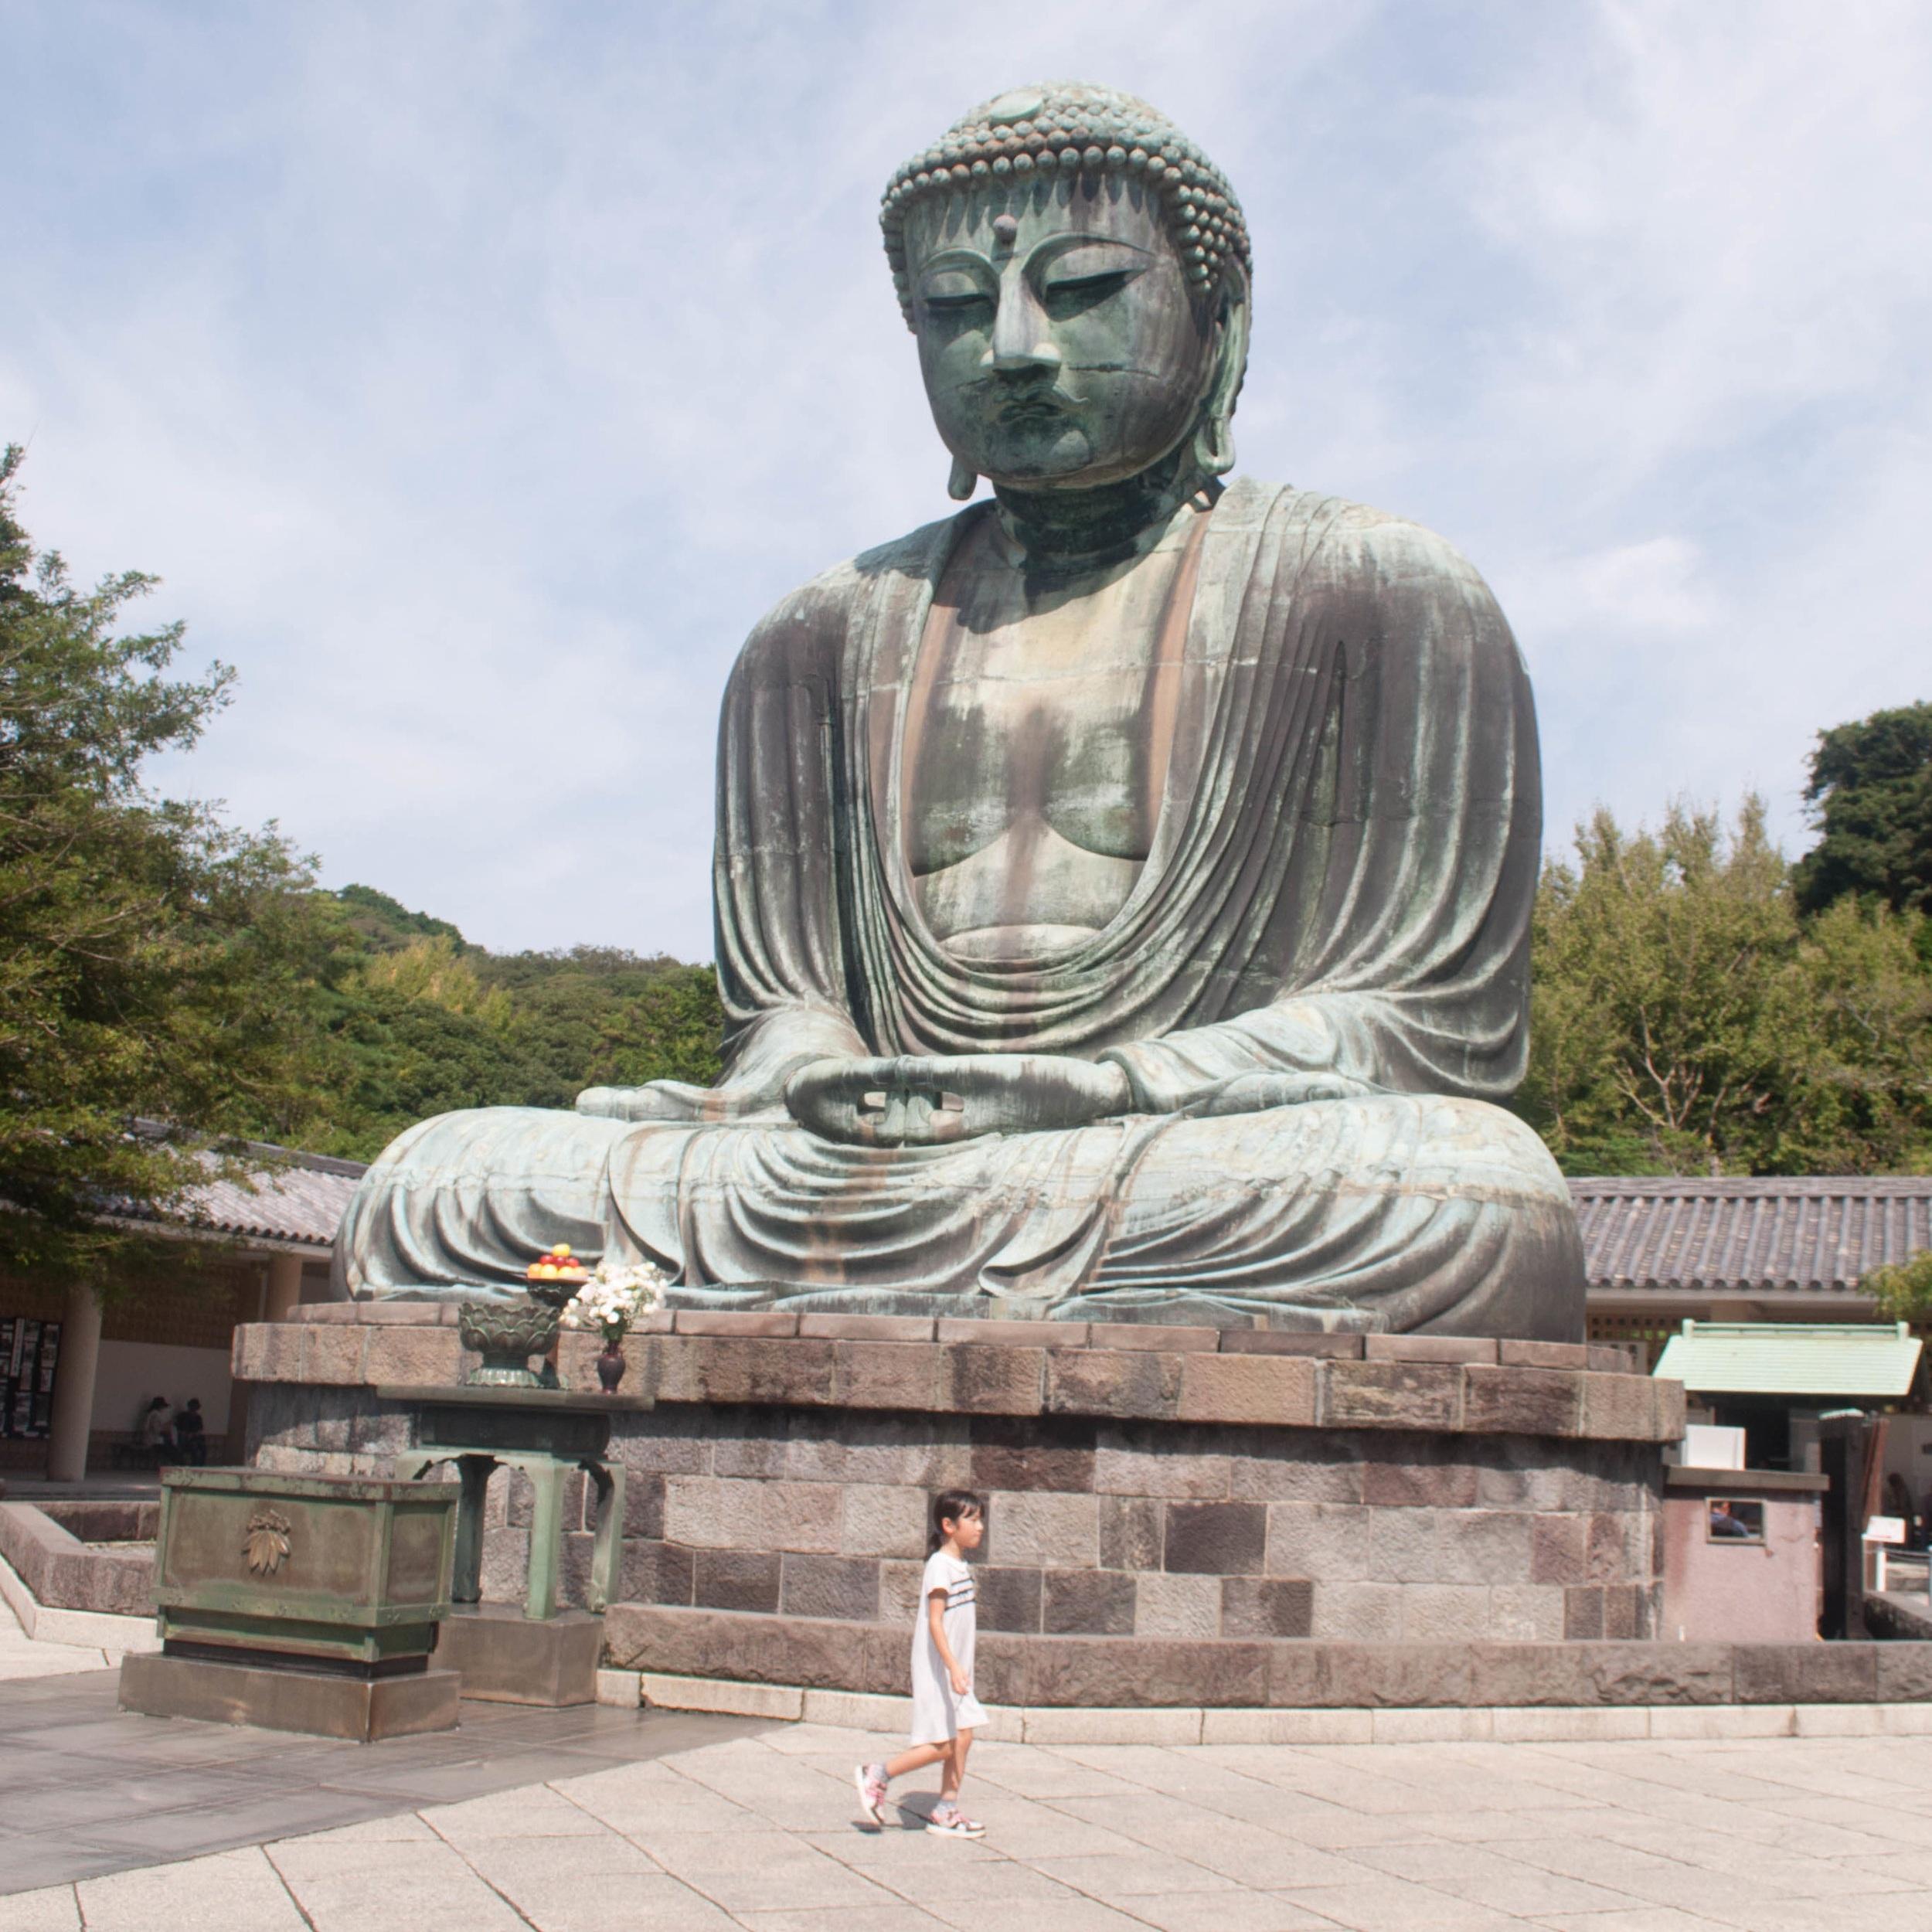 Kamakura Grear Buddha, a day trip from Tokyo. Part of Tokyo itinerary 7 days